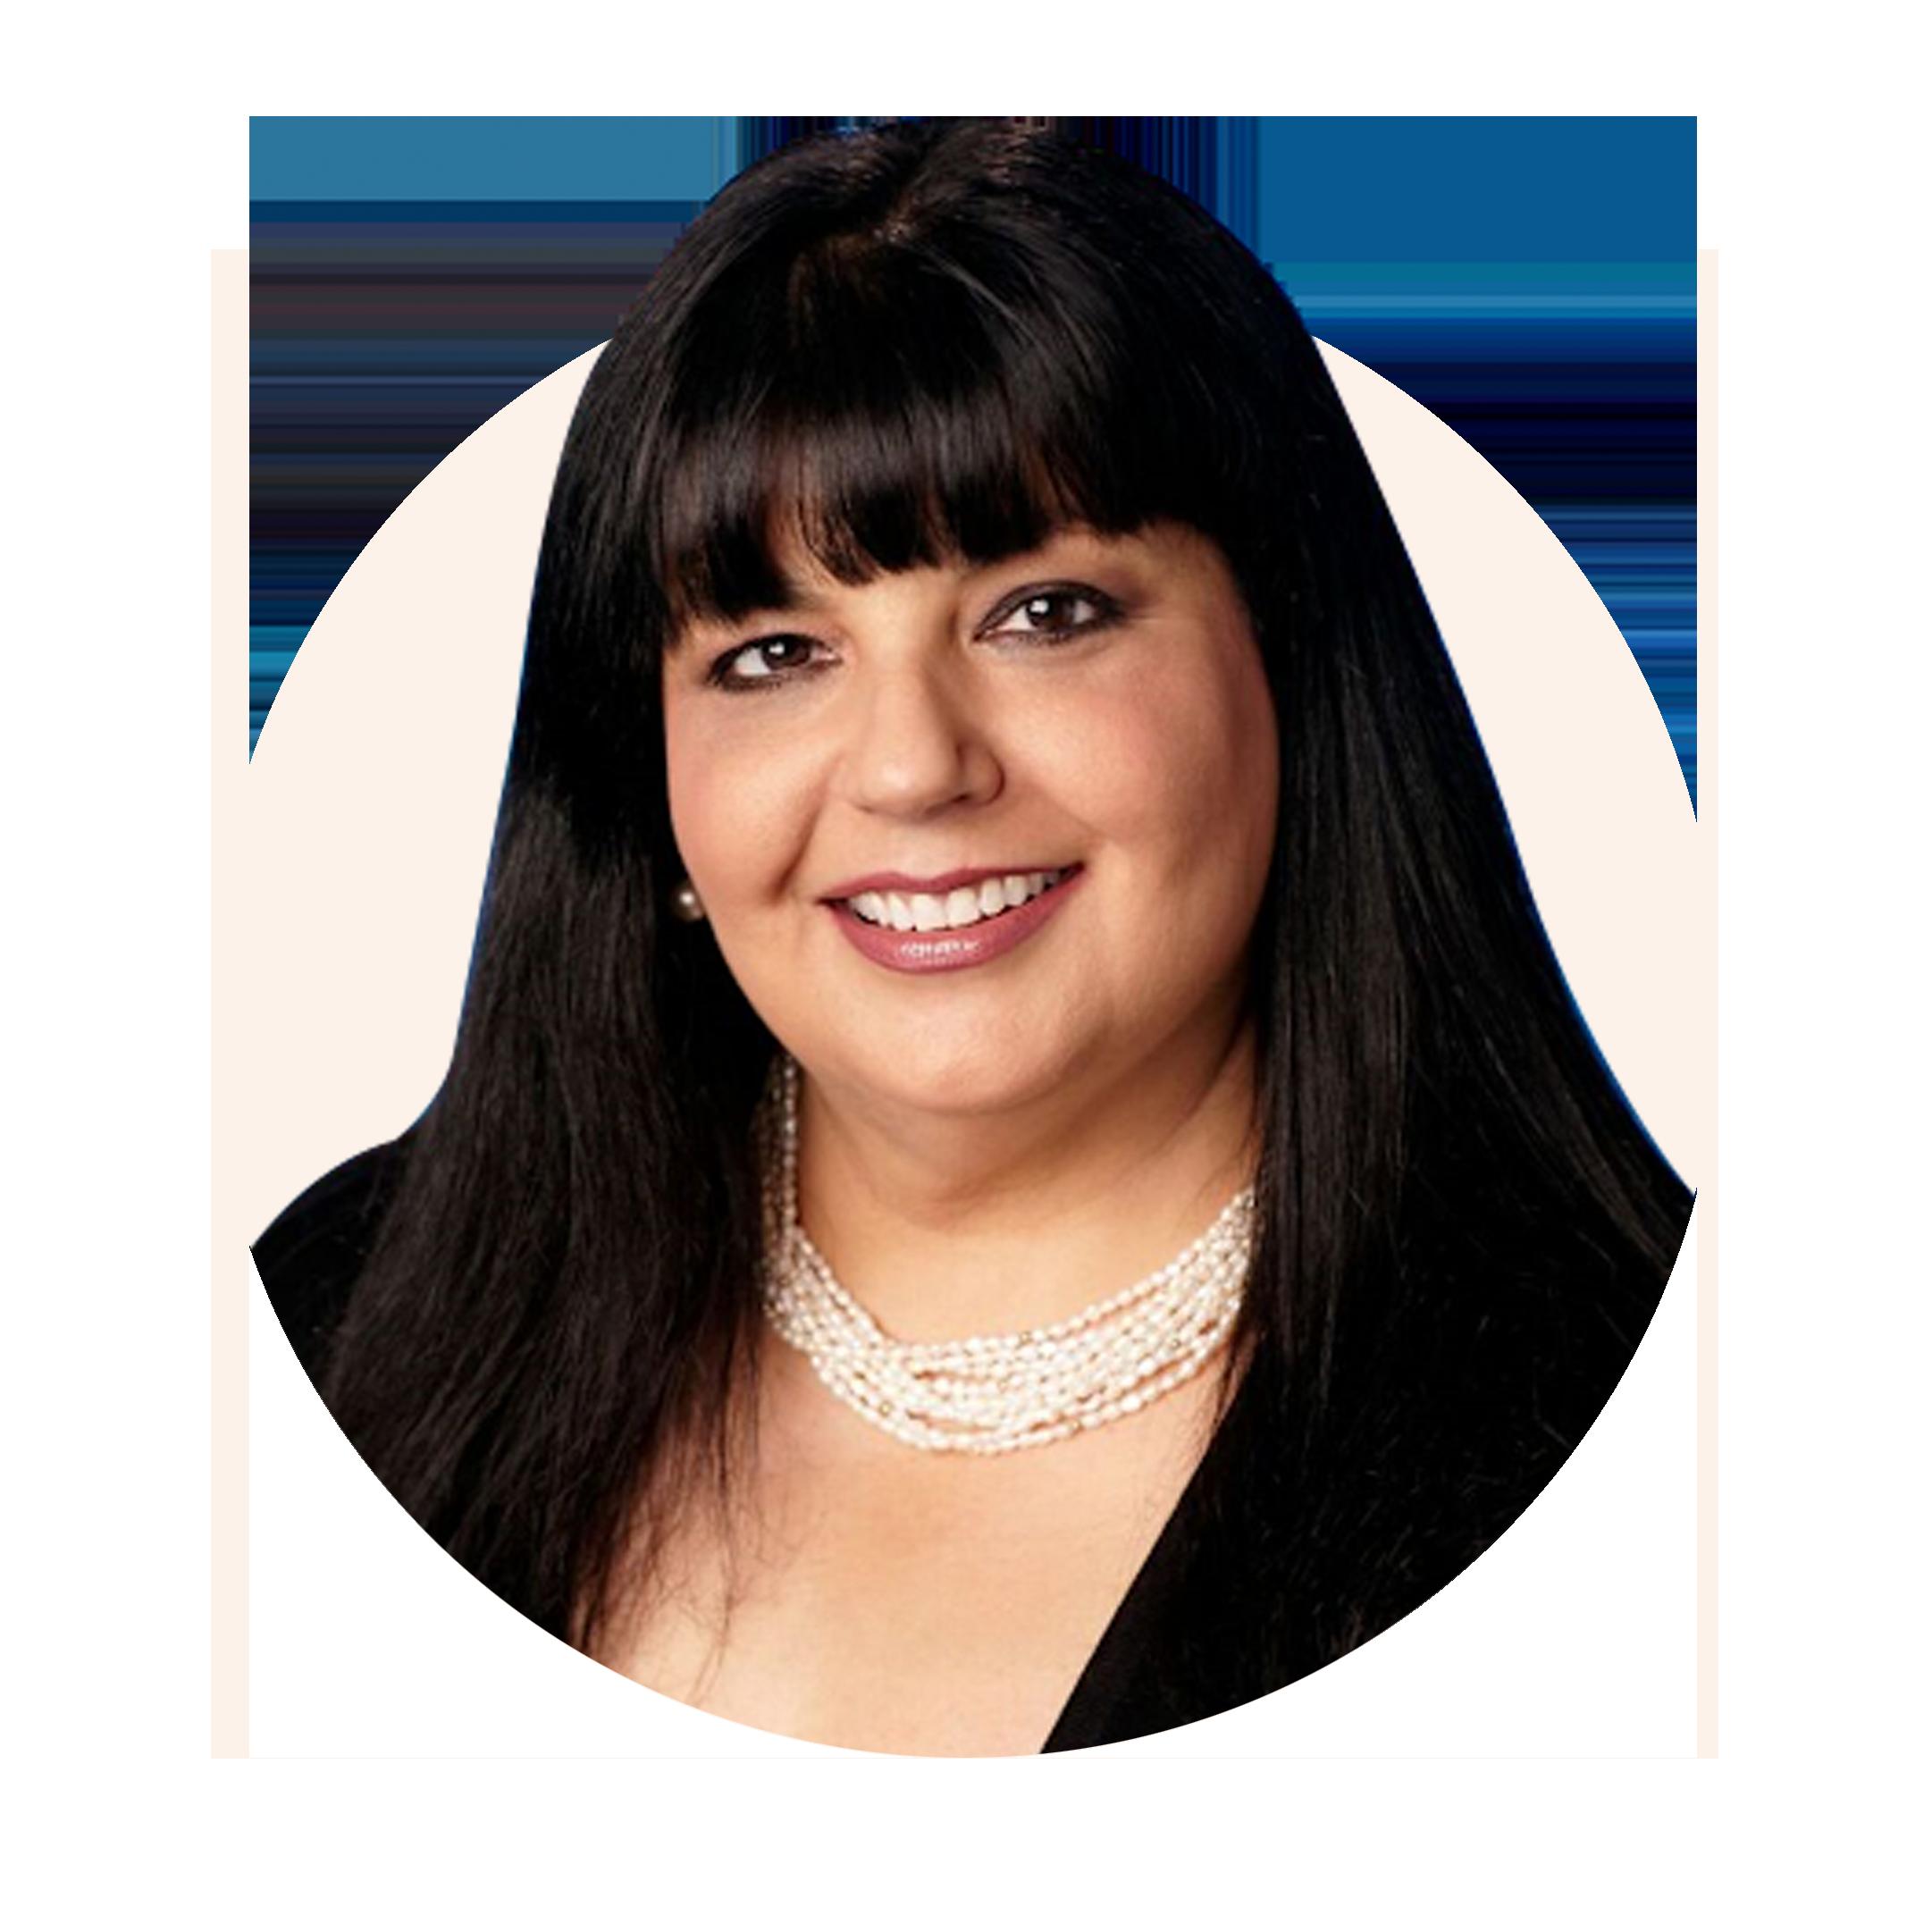 Sidekick profile Graciela Meibar